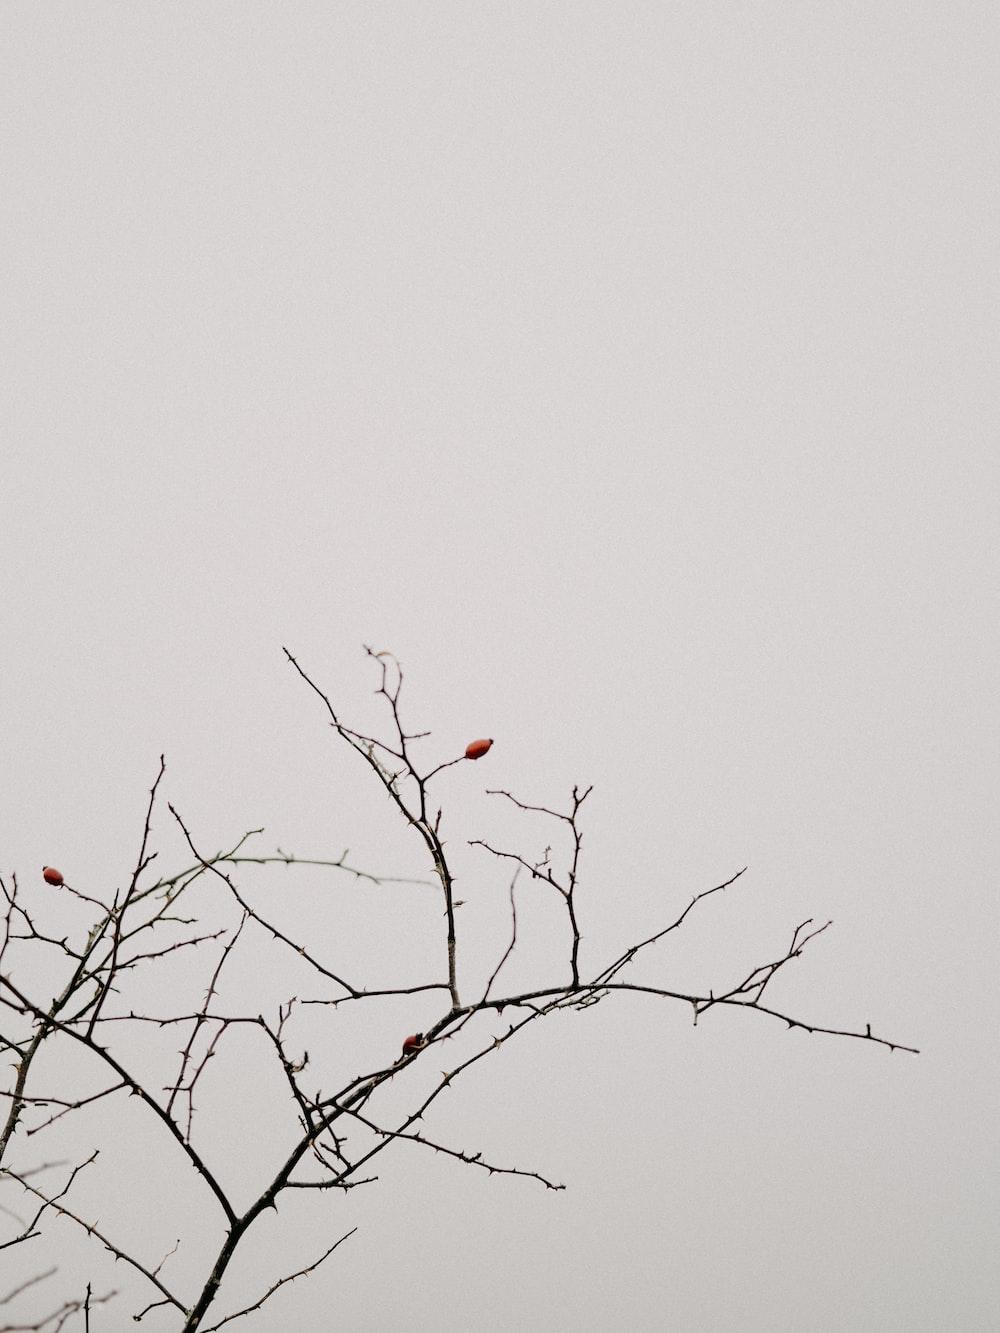 red bird on brown tree branch